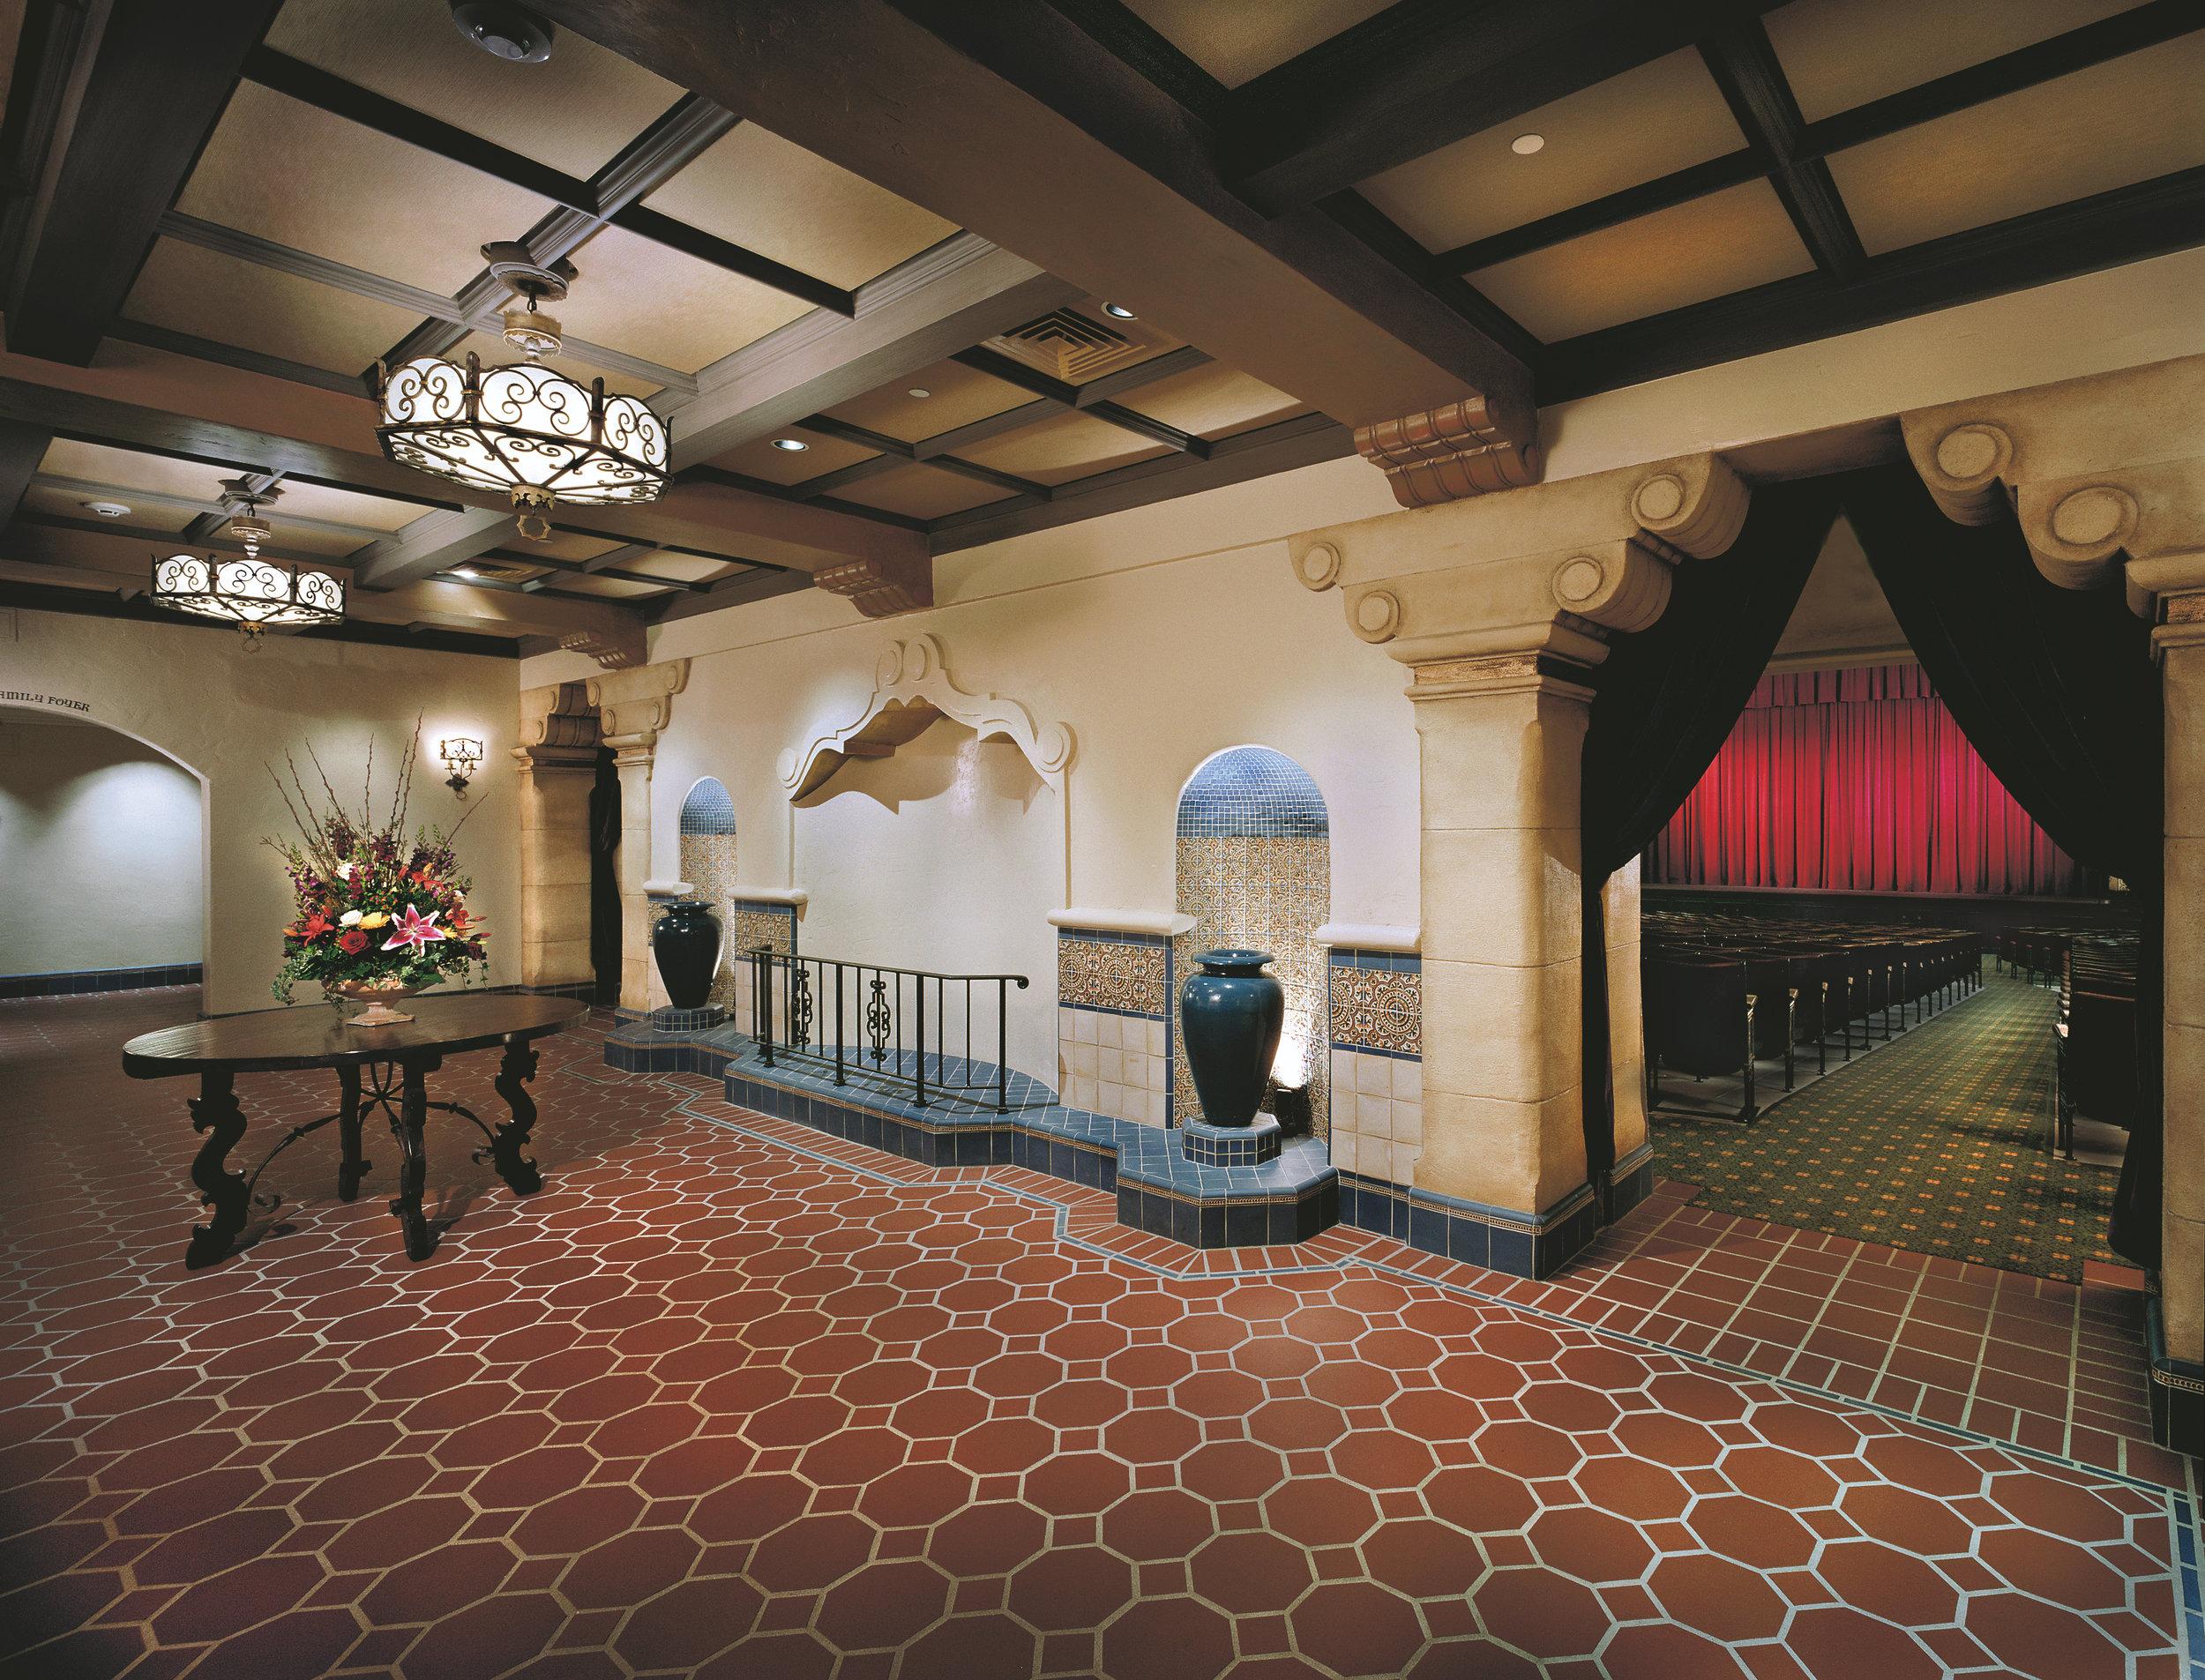 Luke Theatre lobby 01.jpg